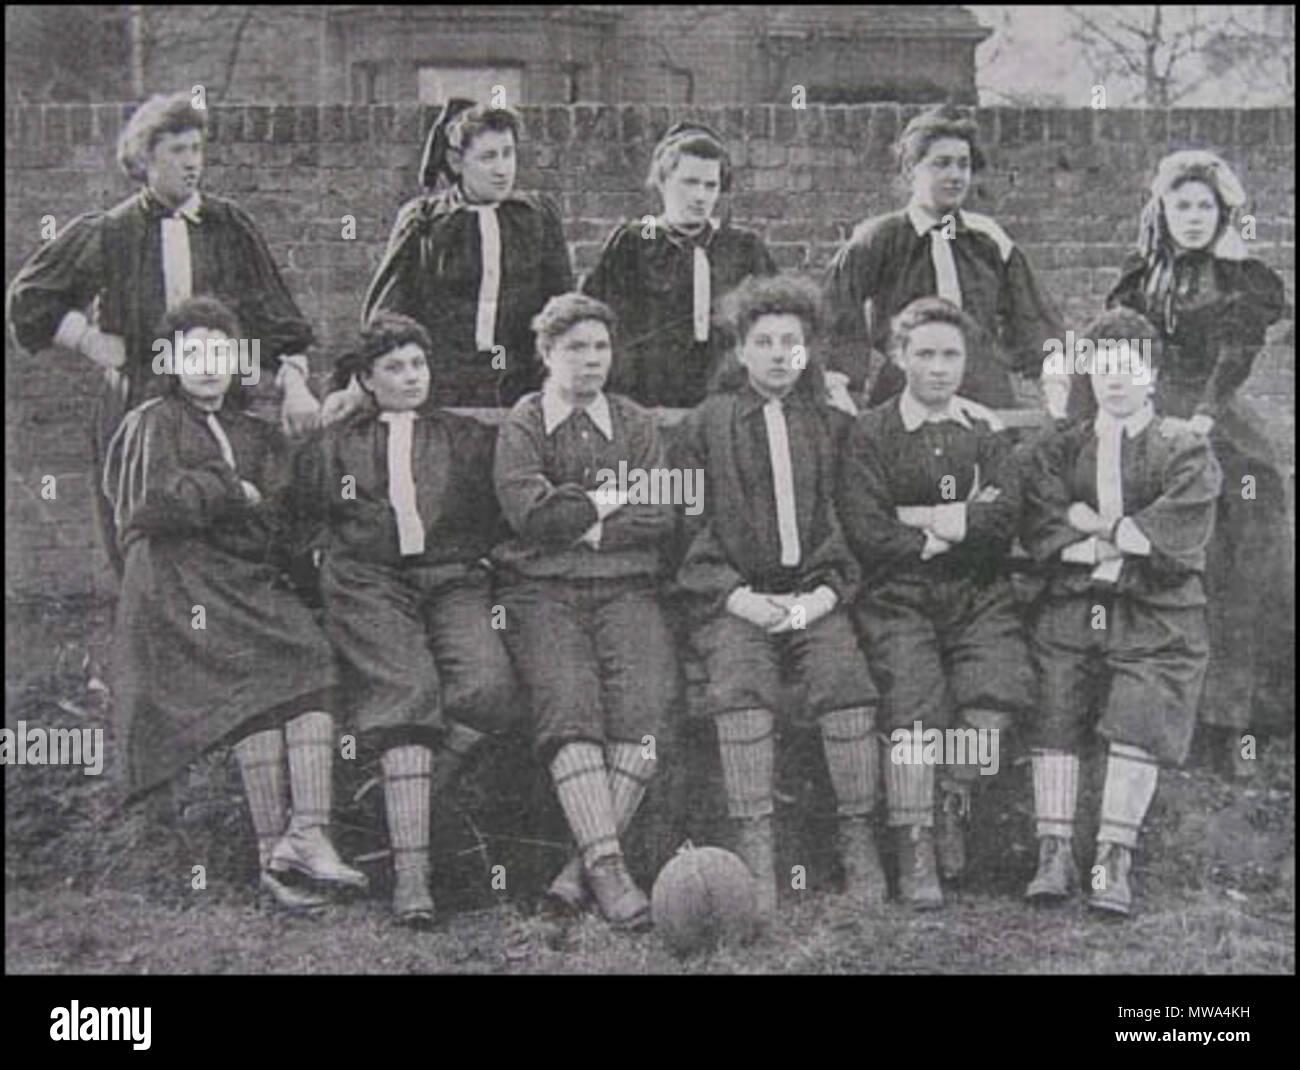 . L'équipe de North London, le 23 mars 1895. Debout: Lily Lynn, Nettie Honeyball, Williams, Edwards, Ide. Assises: Compton, F. B. Fenn, Nellie Gilbert, P. Smith, Rosa Thiere, Biggs. 1895. Unknown 98 British Ladies Football Club - Stock Image